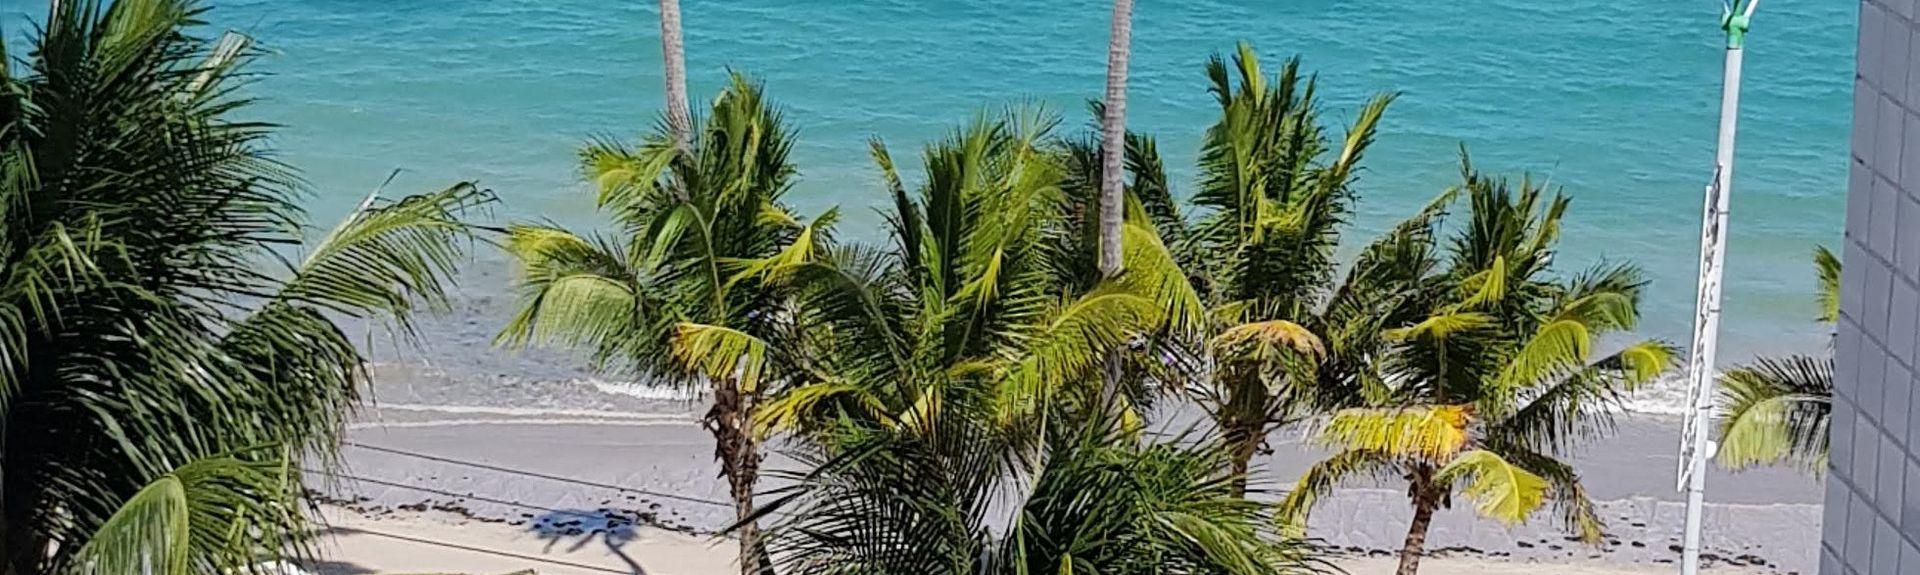 Praia de Paripueira, Paripueira, Alagoas, Brasil